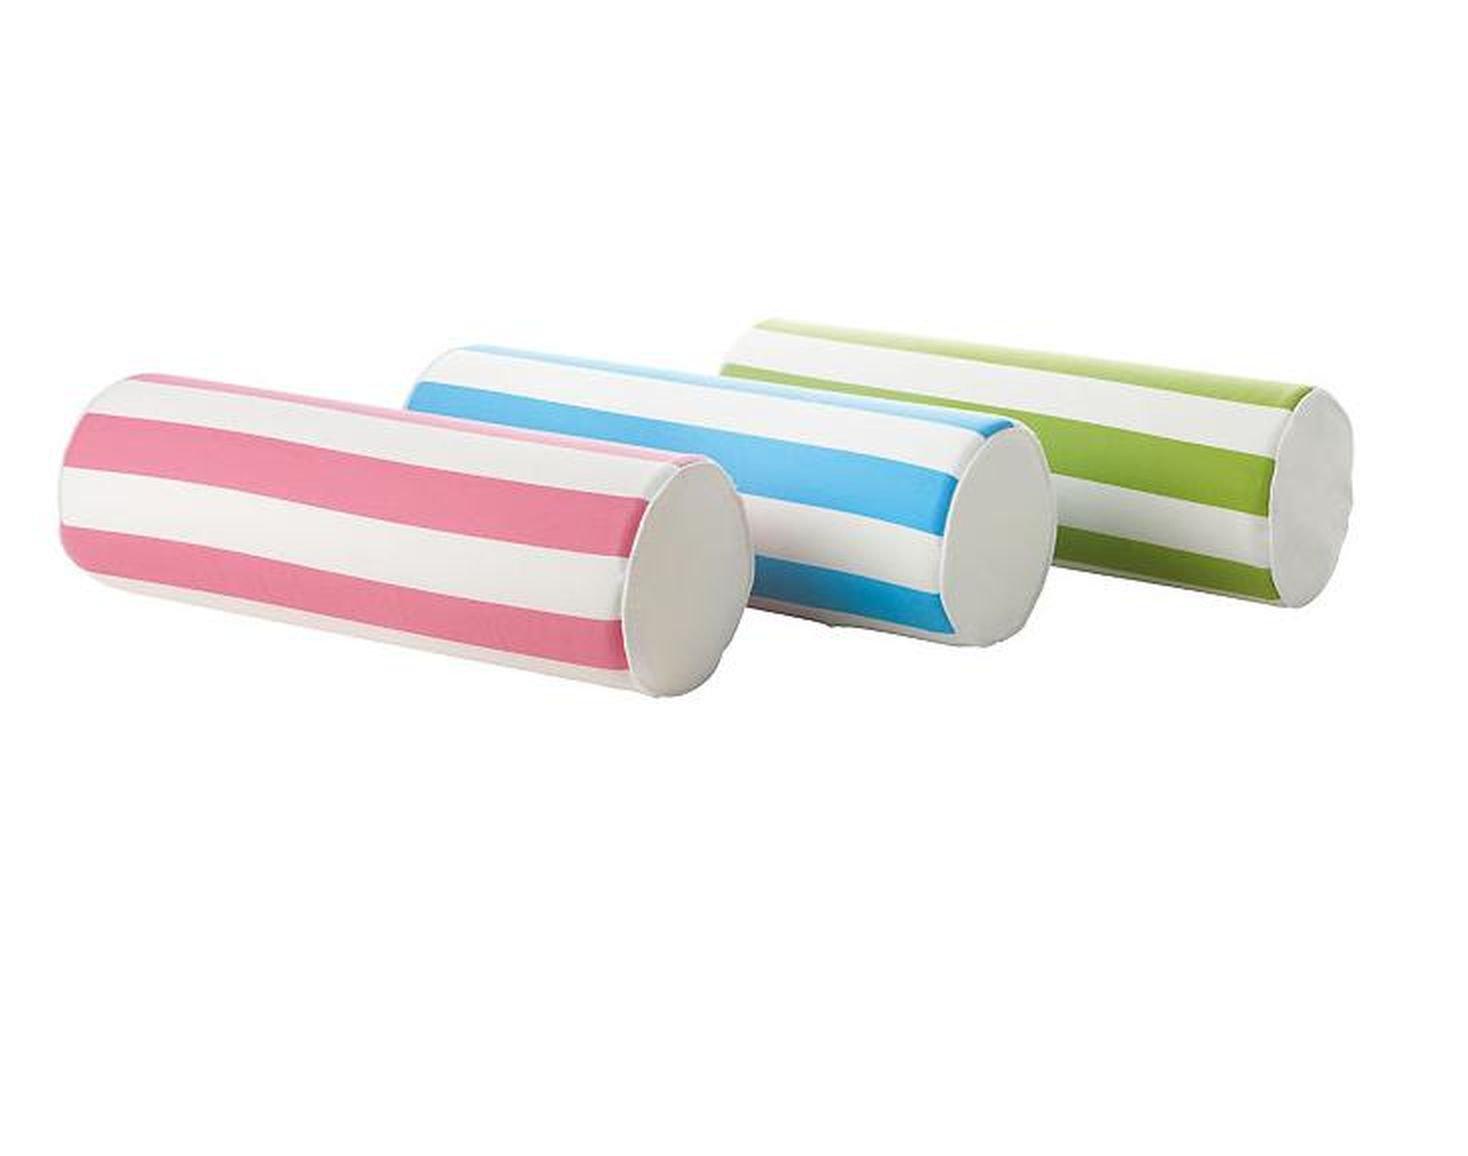 IKEA GRONSKA Grönska CUSHION Accent Bolster Roll Pillow GREEN White Stripe Cylindrical Sommar 2018